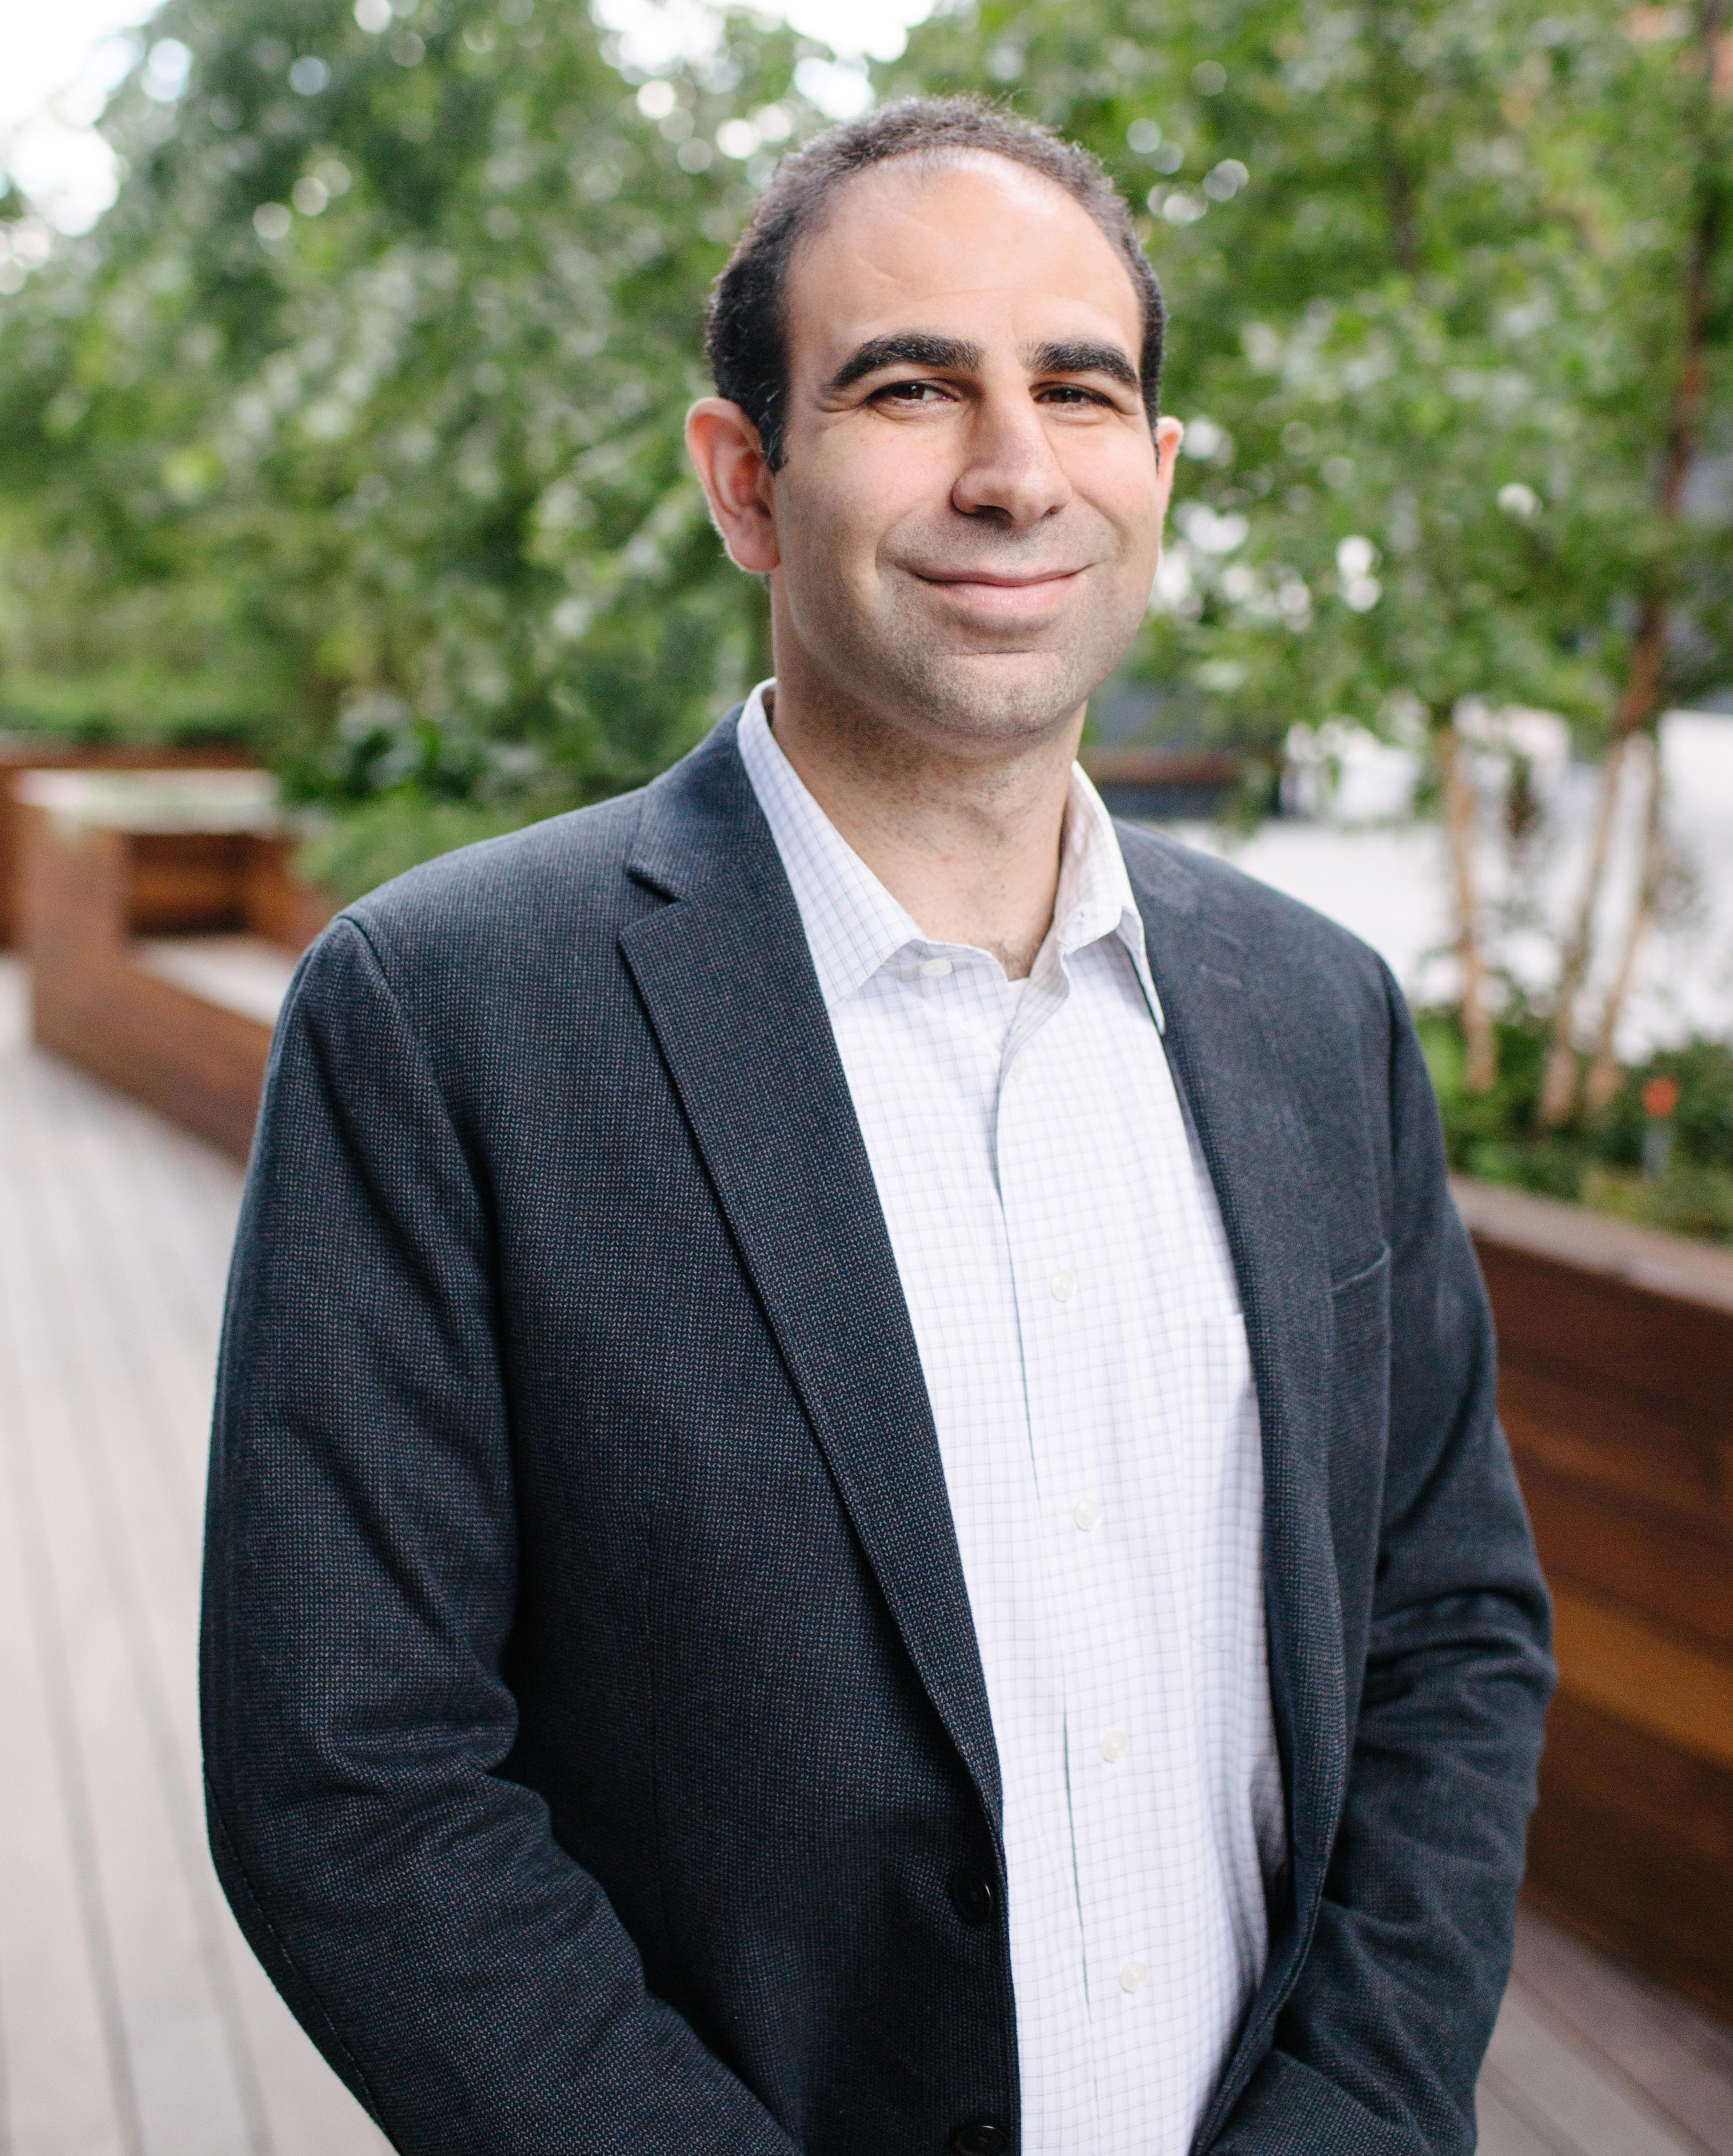 Eytan Seidman